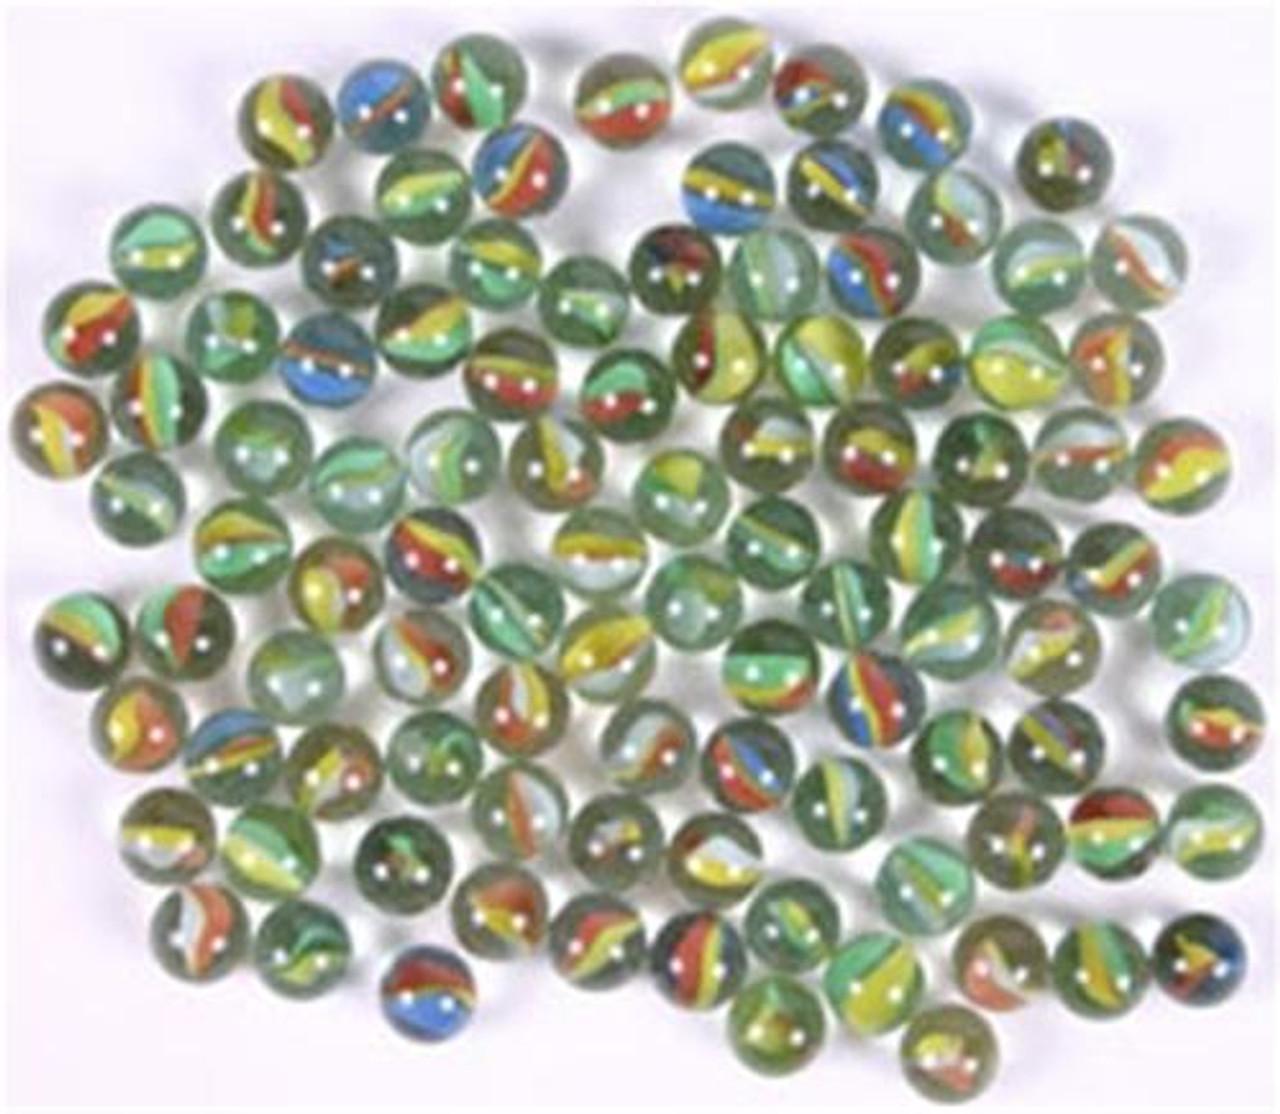 Cherry Tree Toys Marbles